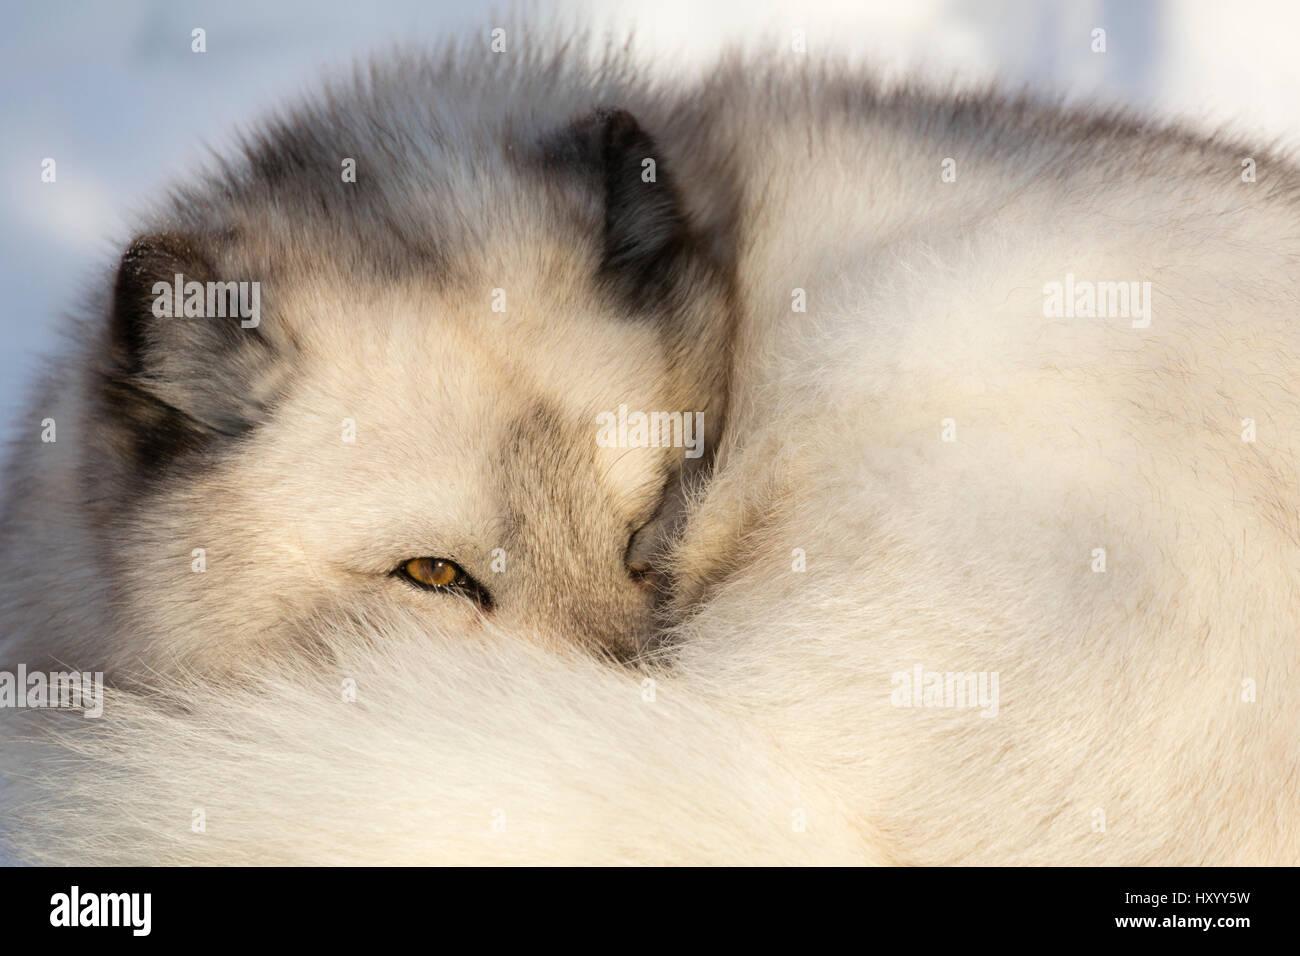 Arctic fox vixen (Vulpes lagopus), captive, Highland Wildlife Park, Kingussie, Scottish Highlands, UK, December. Stock Photo